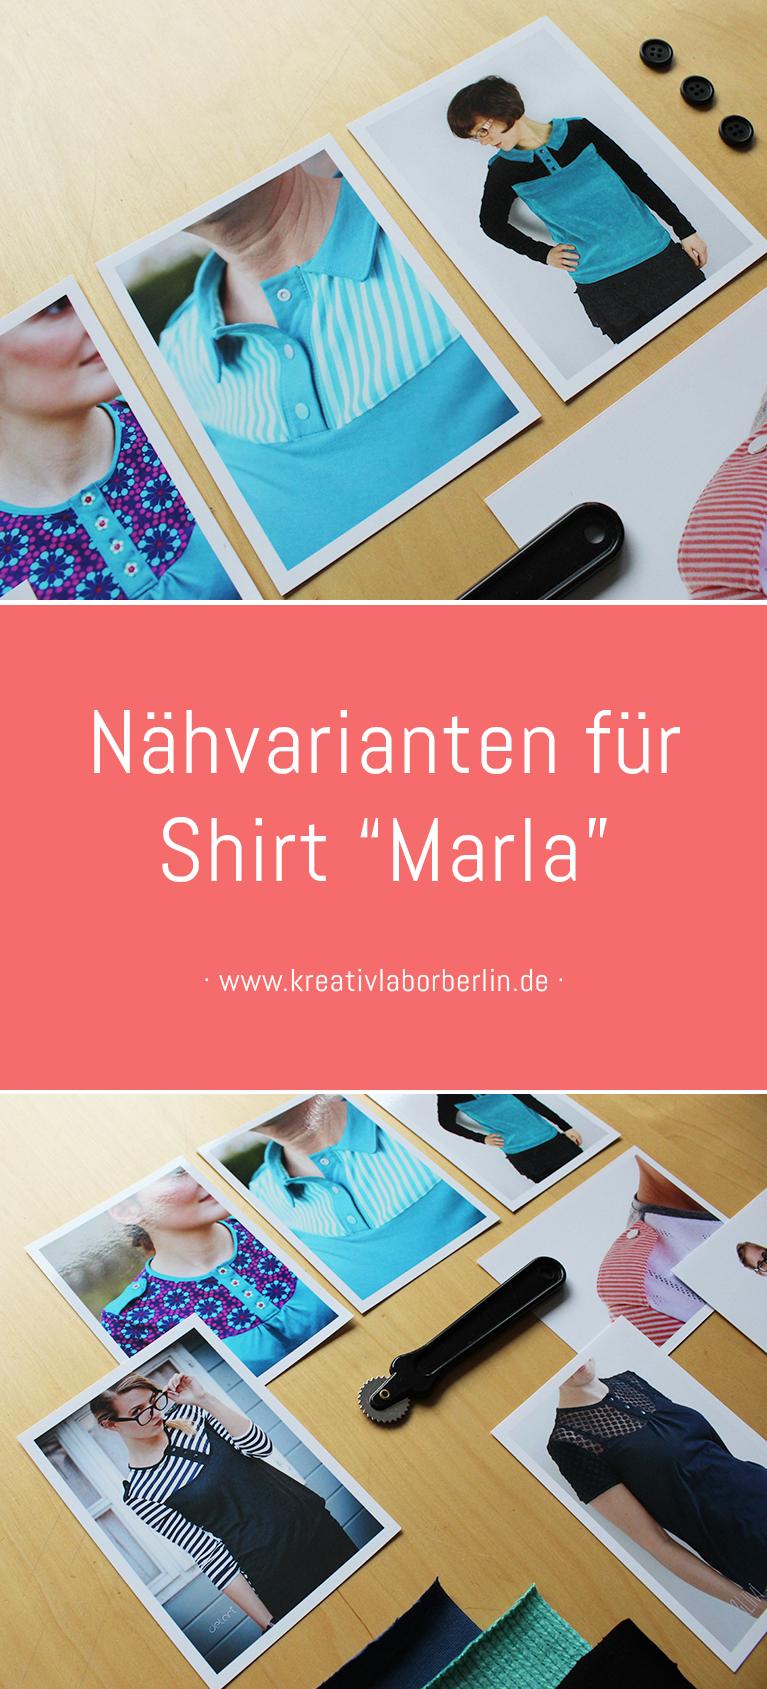 "Nähvarianten & Inspirationen für Shirt ""Marla"""